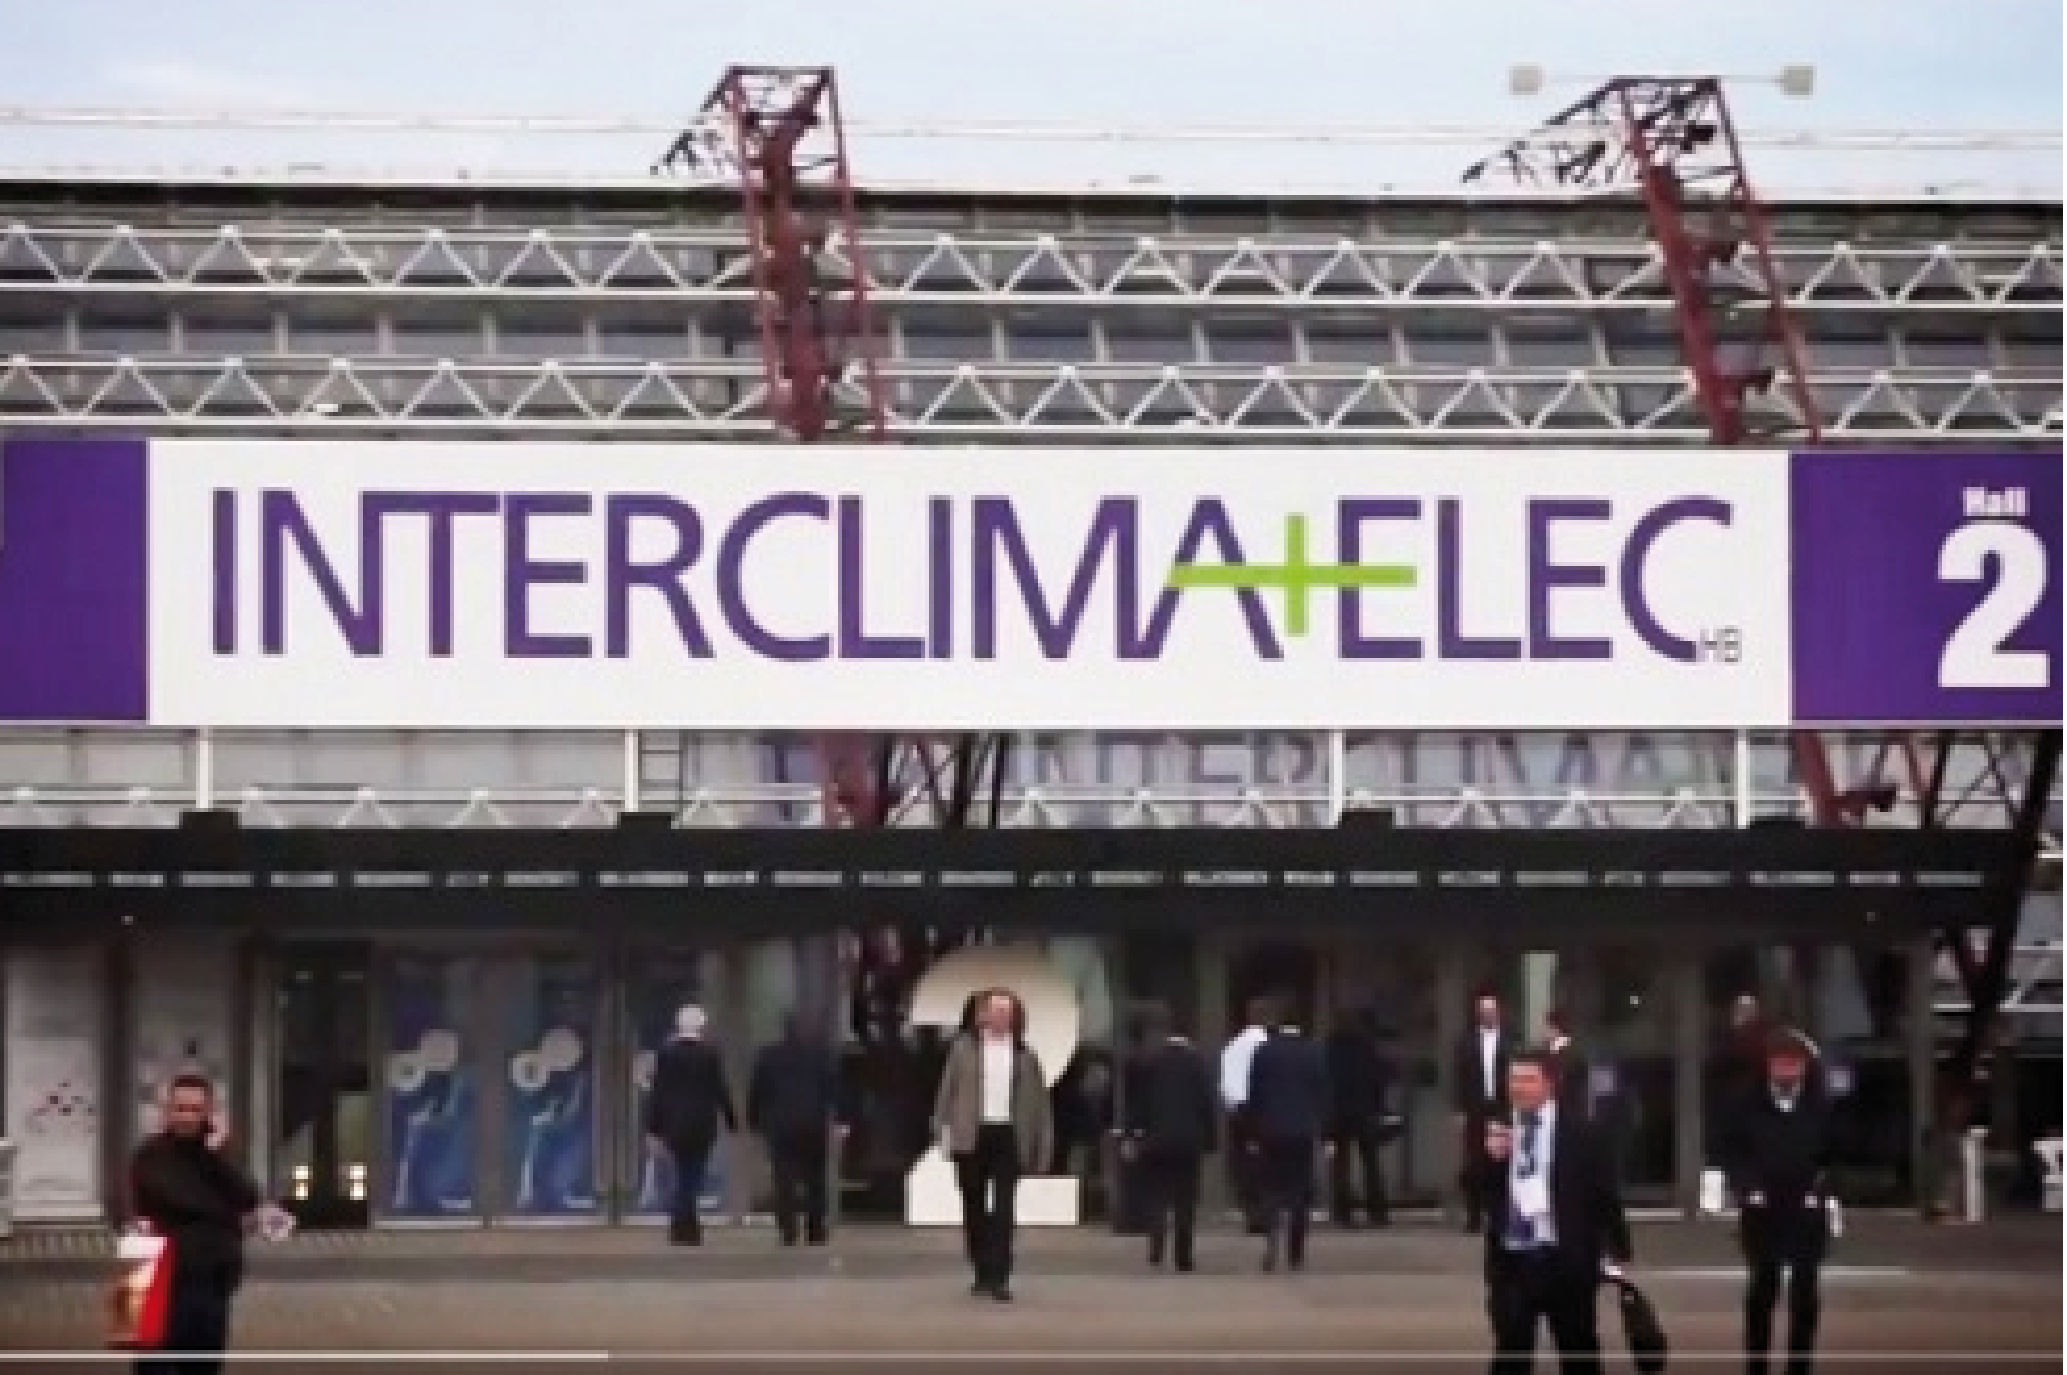 INTERCLIMA+ELEC, Paris